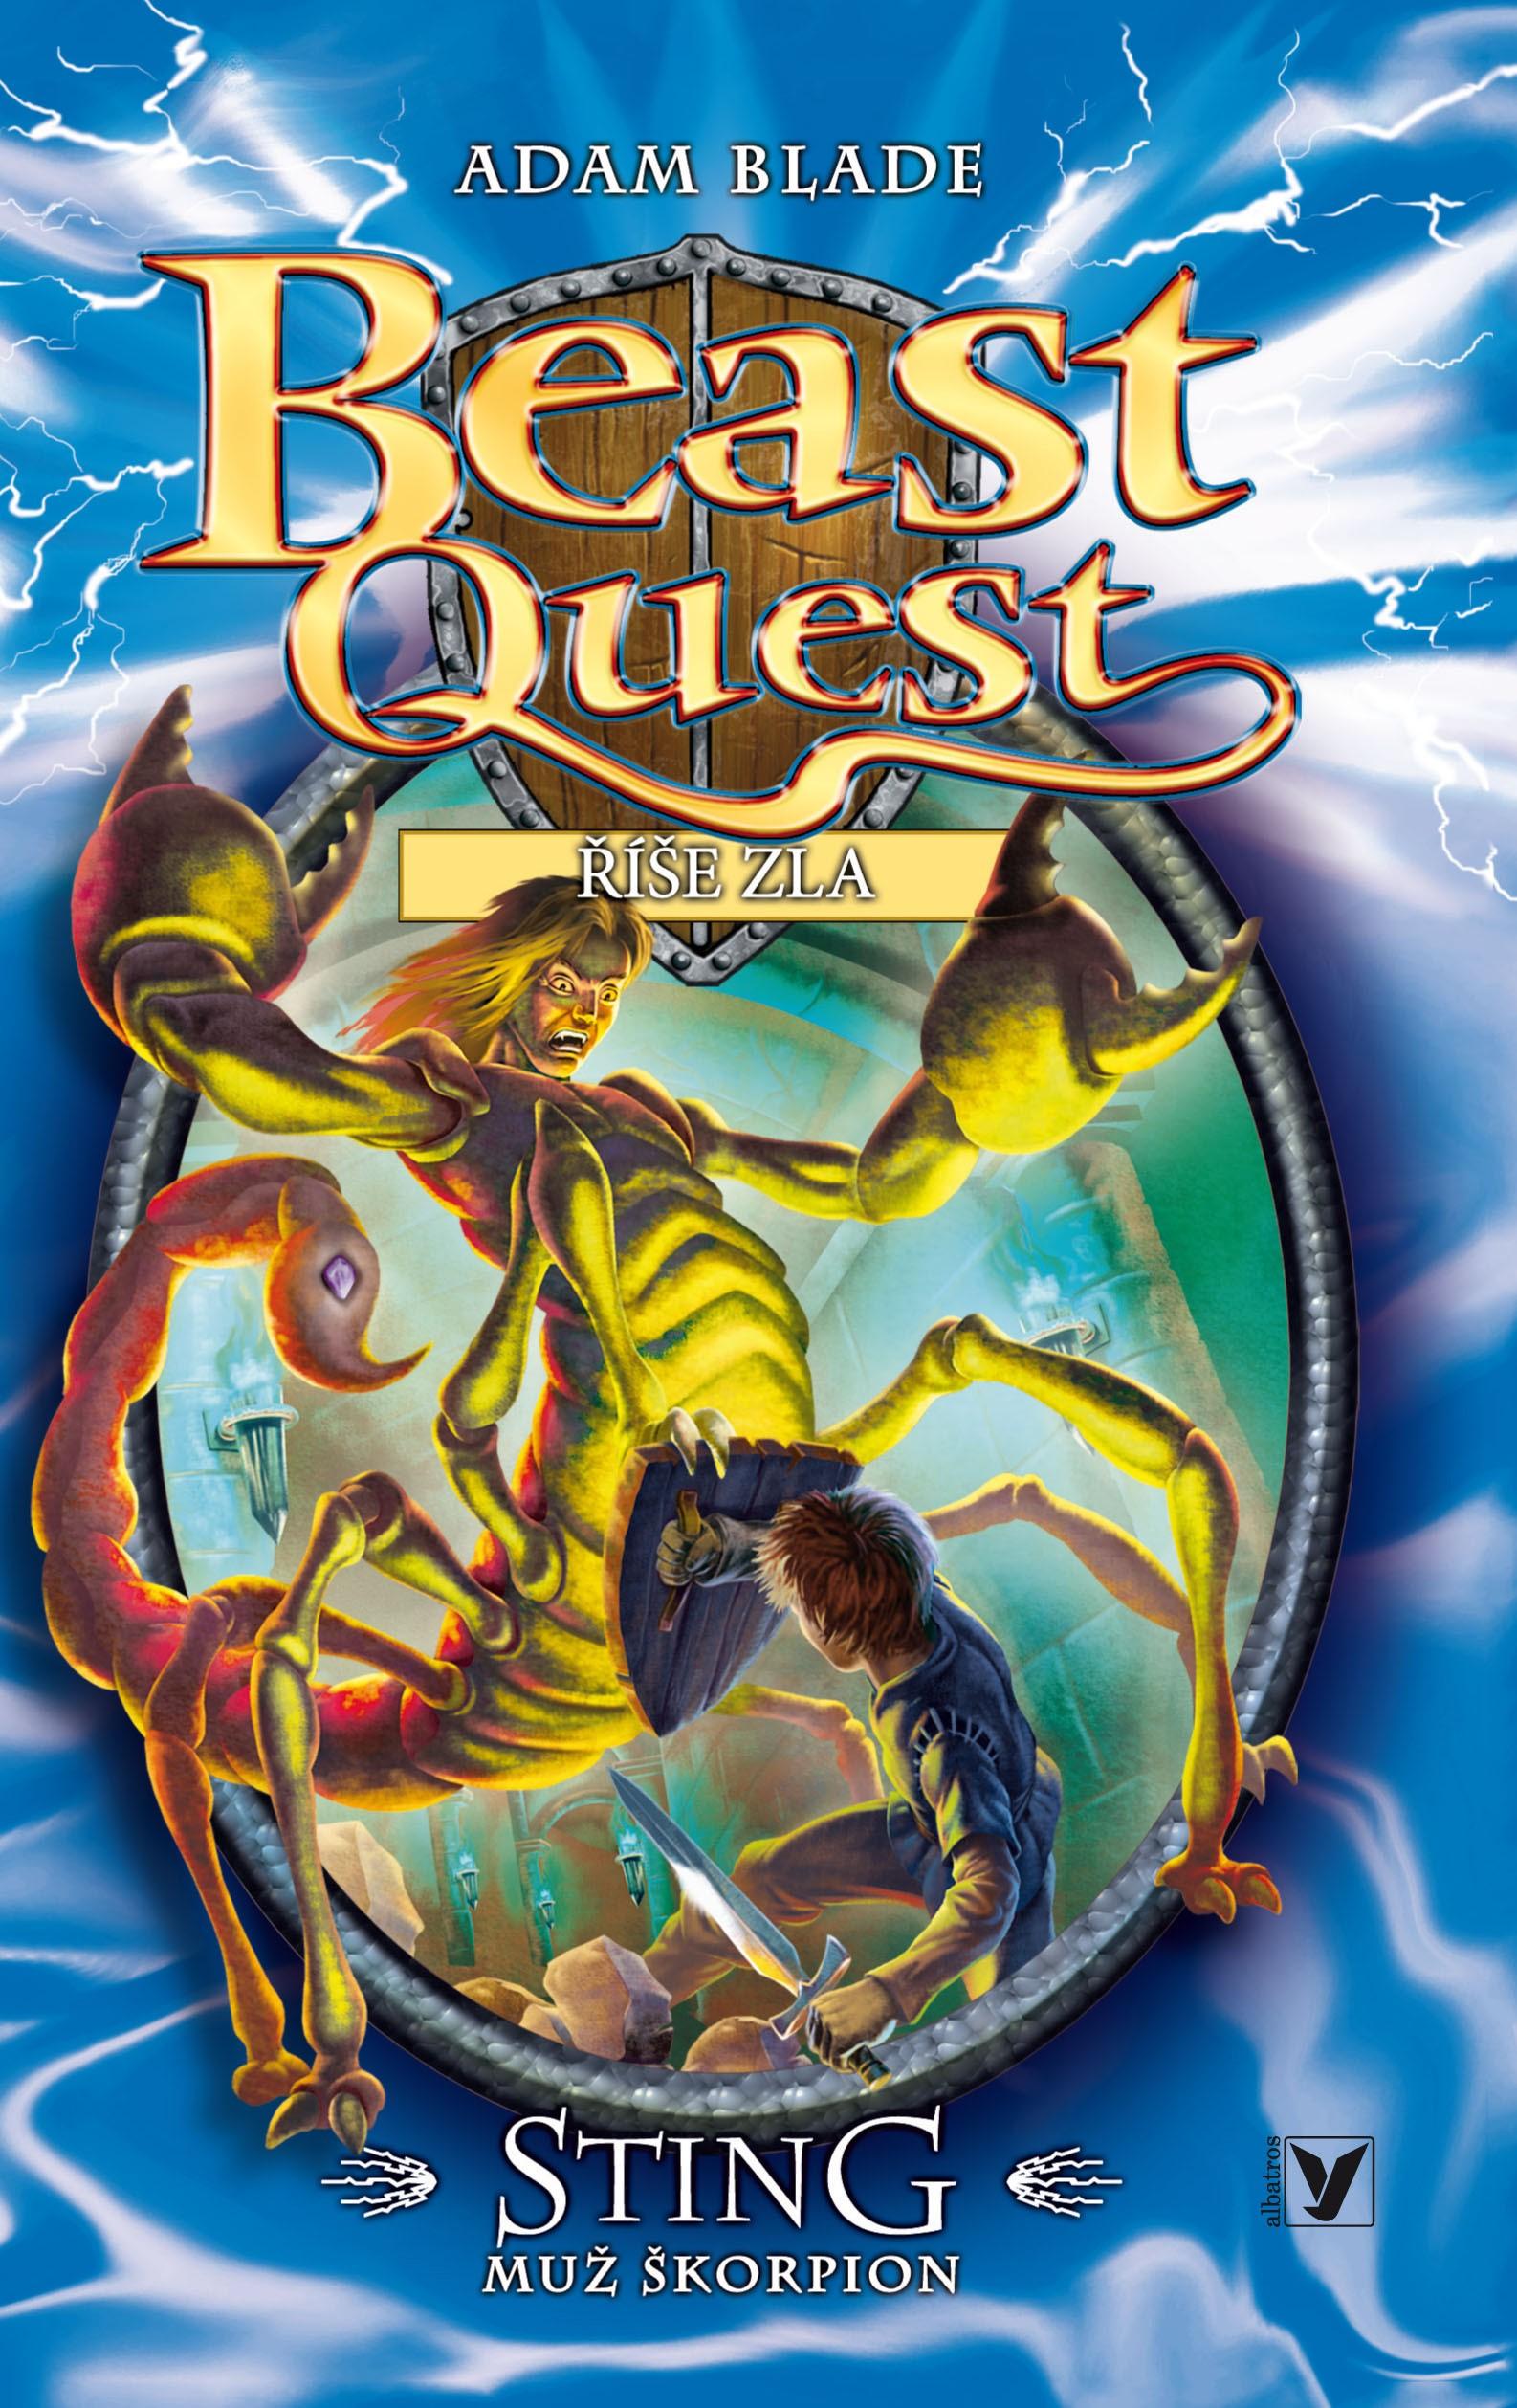 Sting, muž škorpion - Beast Quest (18)